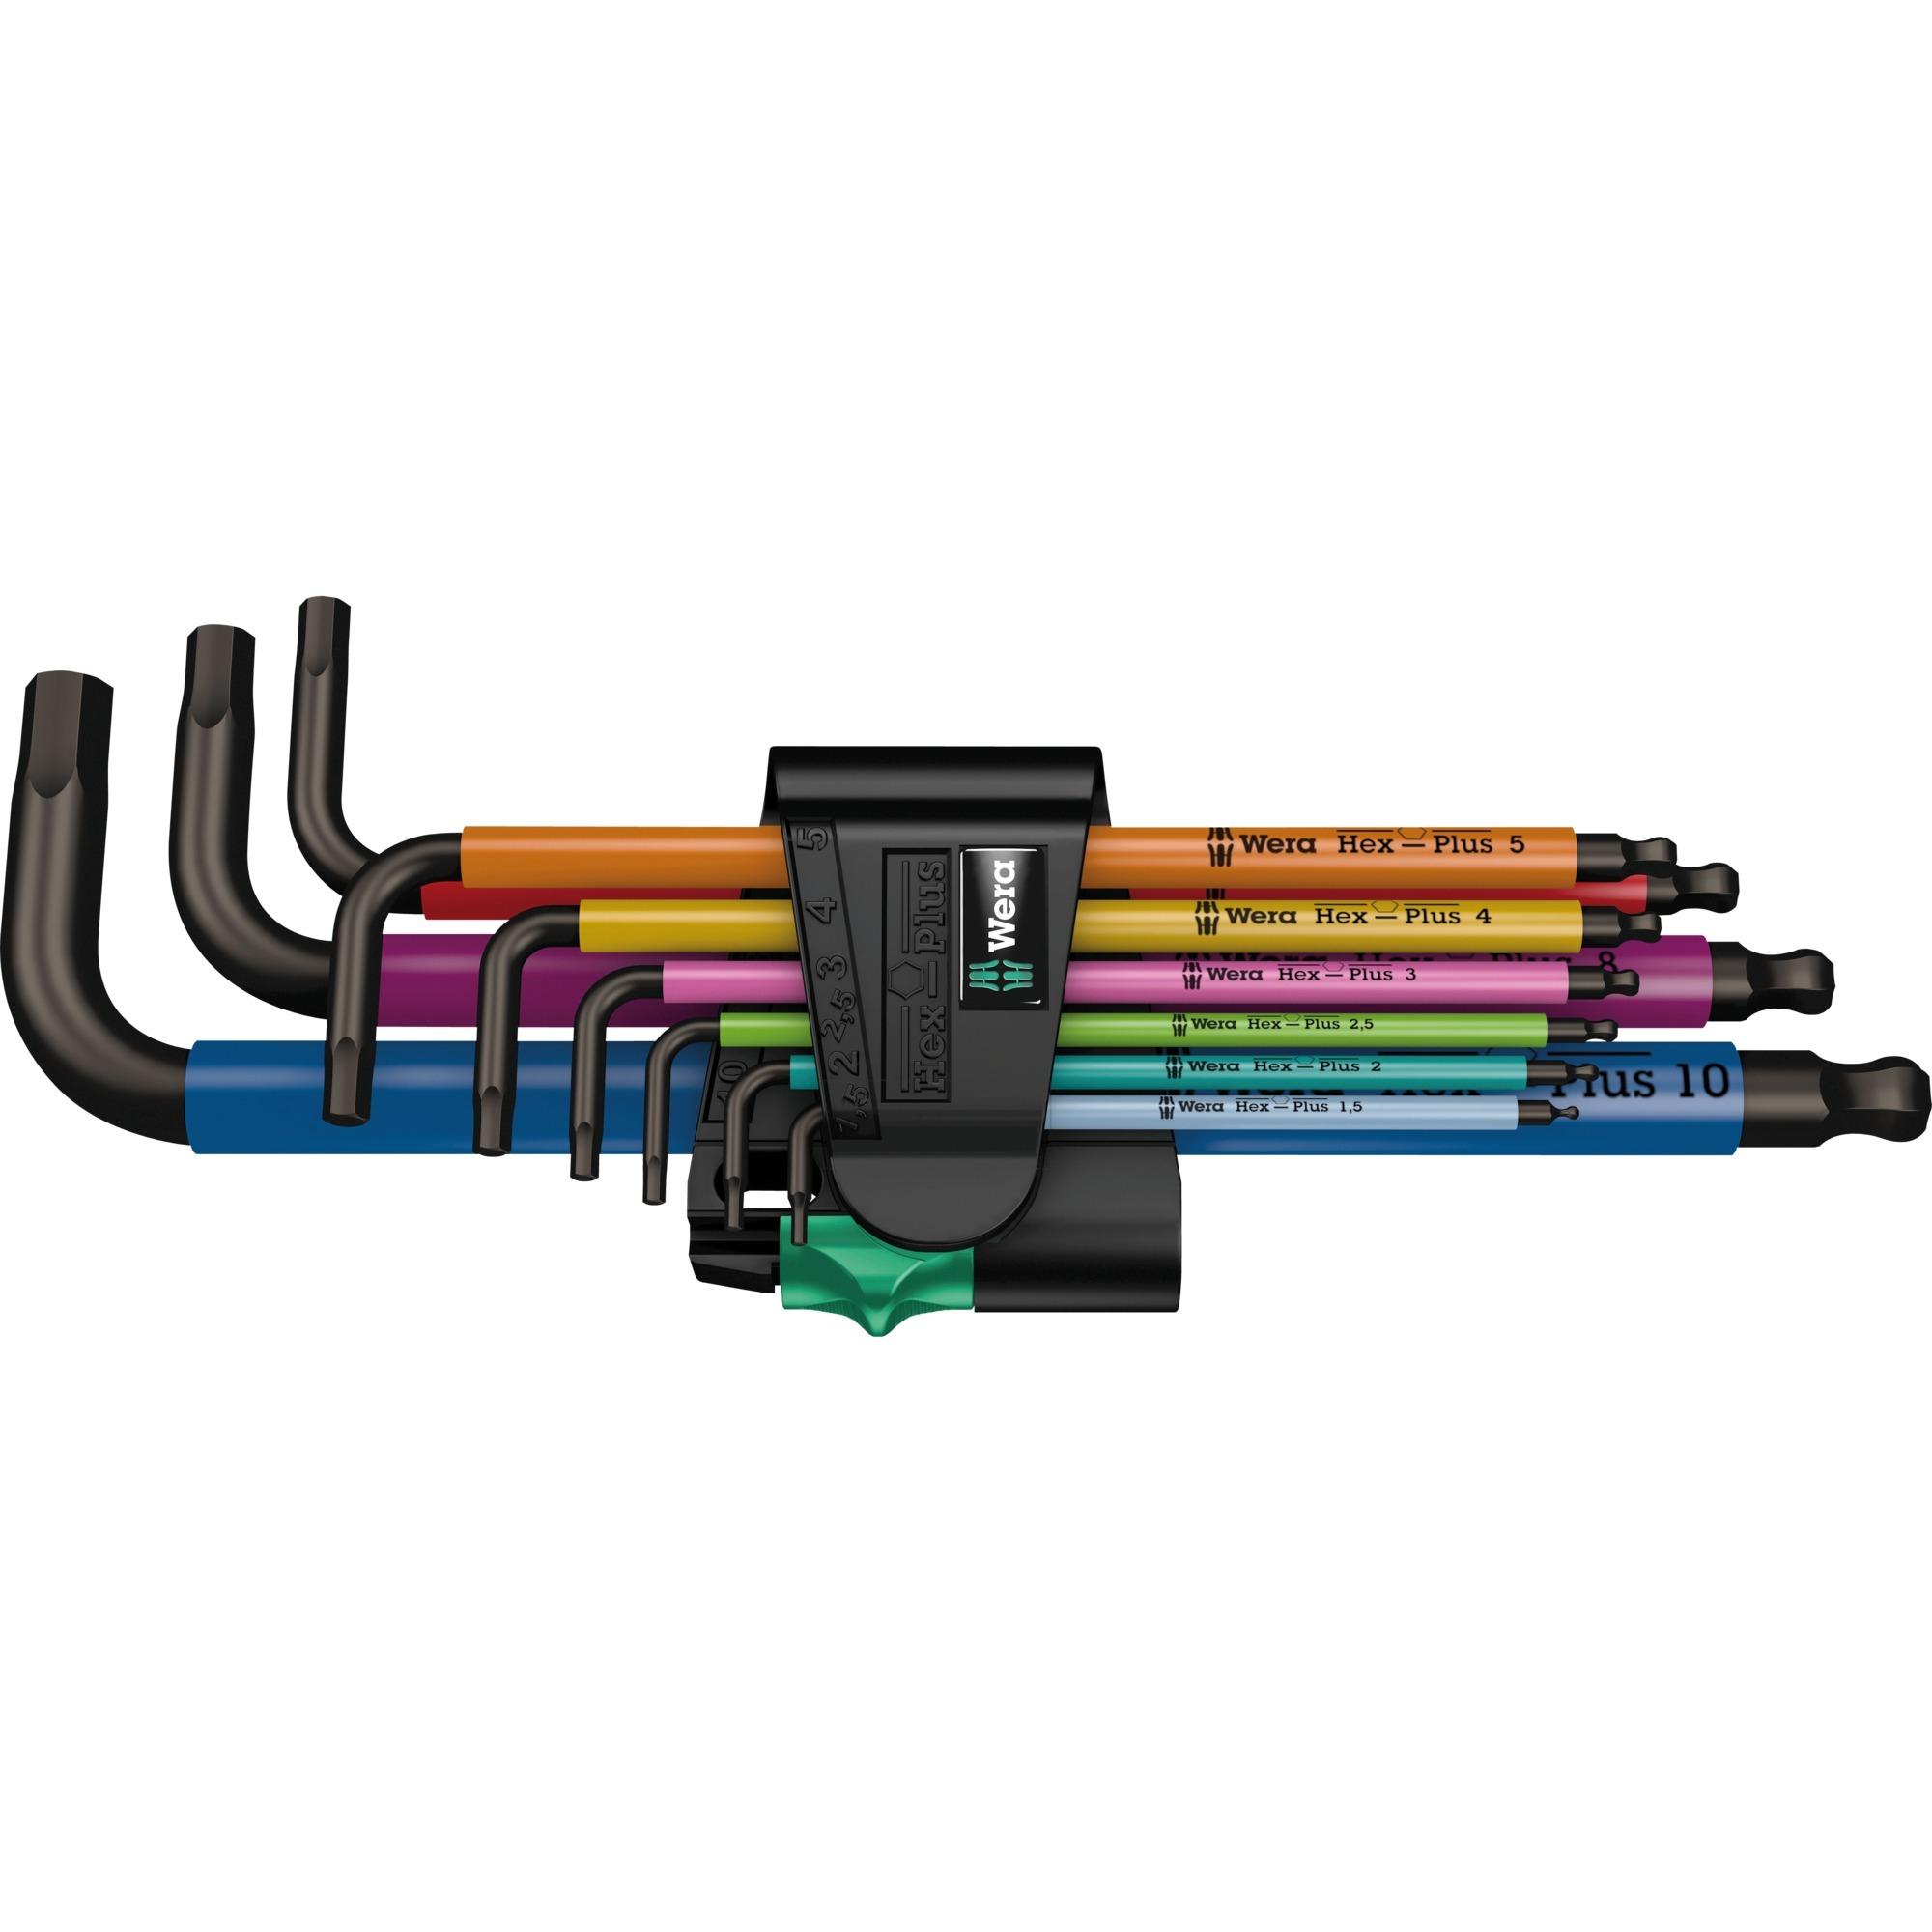 950 SPKL/9 SM N SB Multicolour, Destornillador